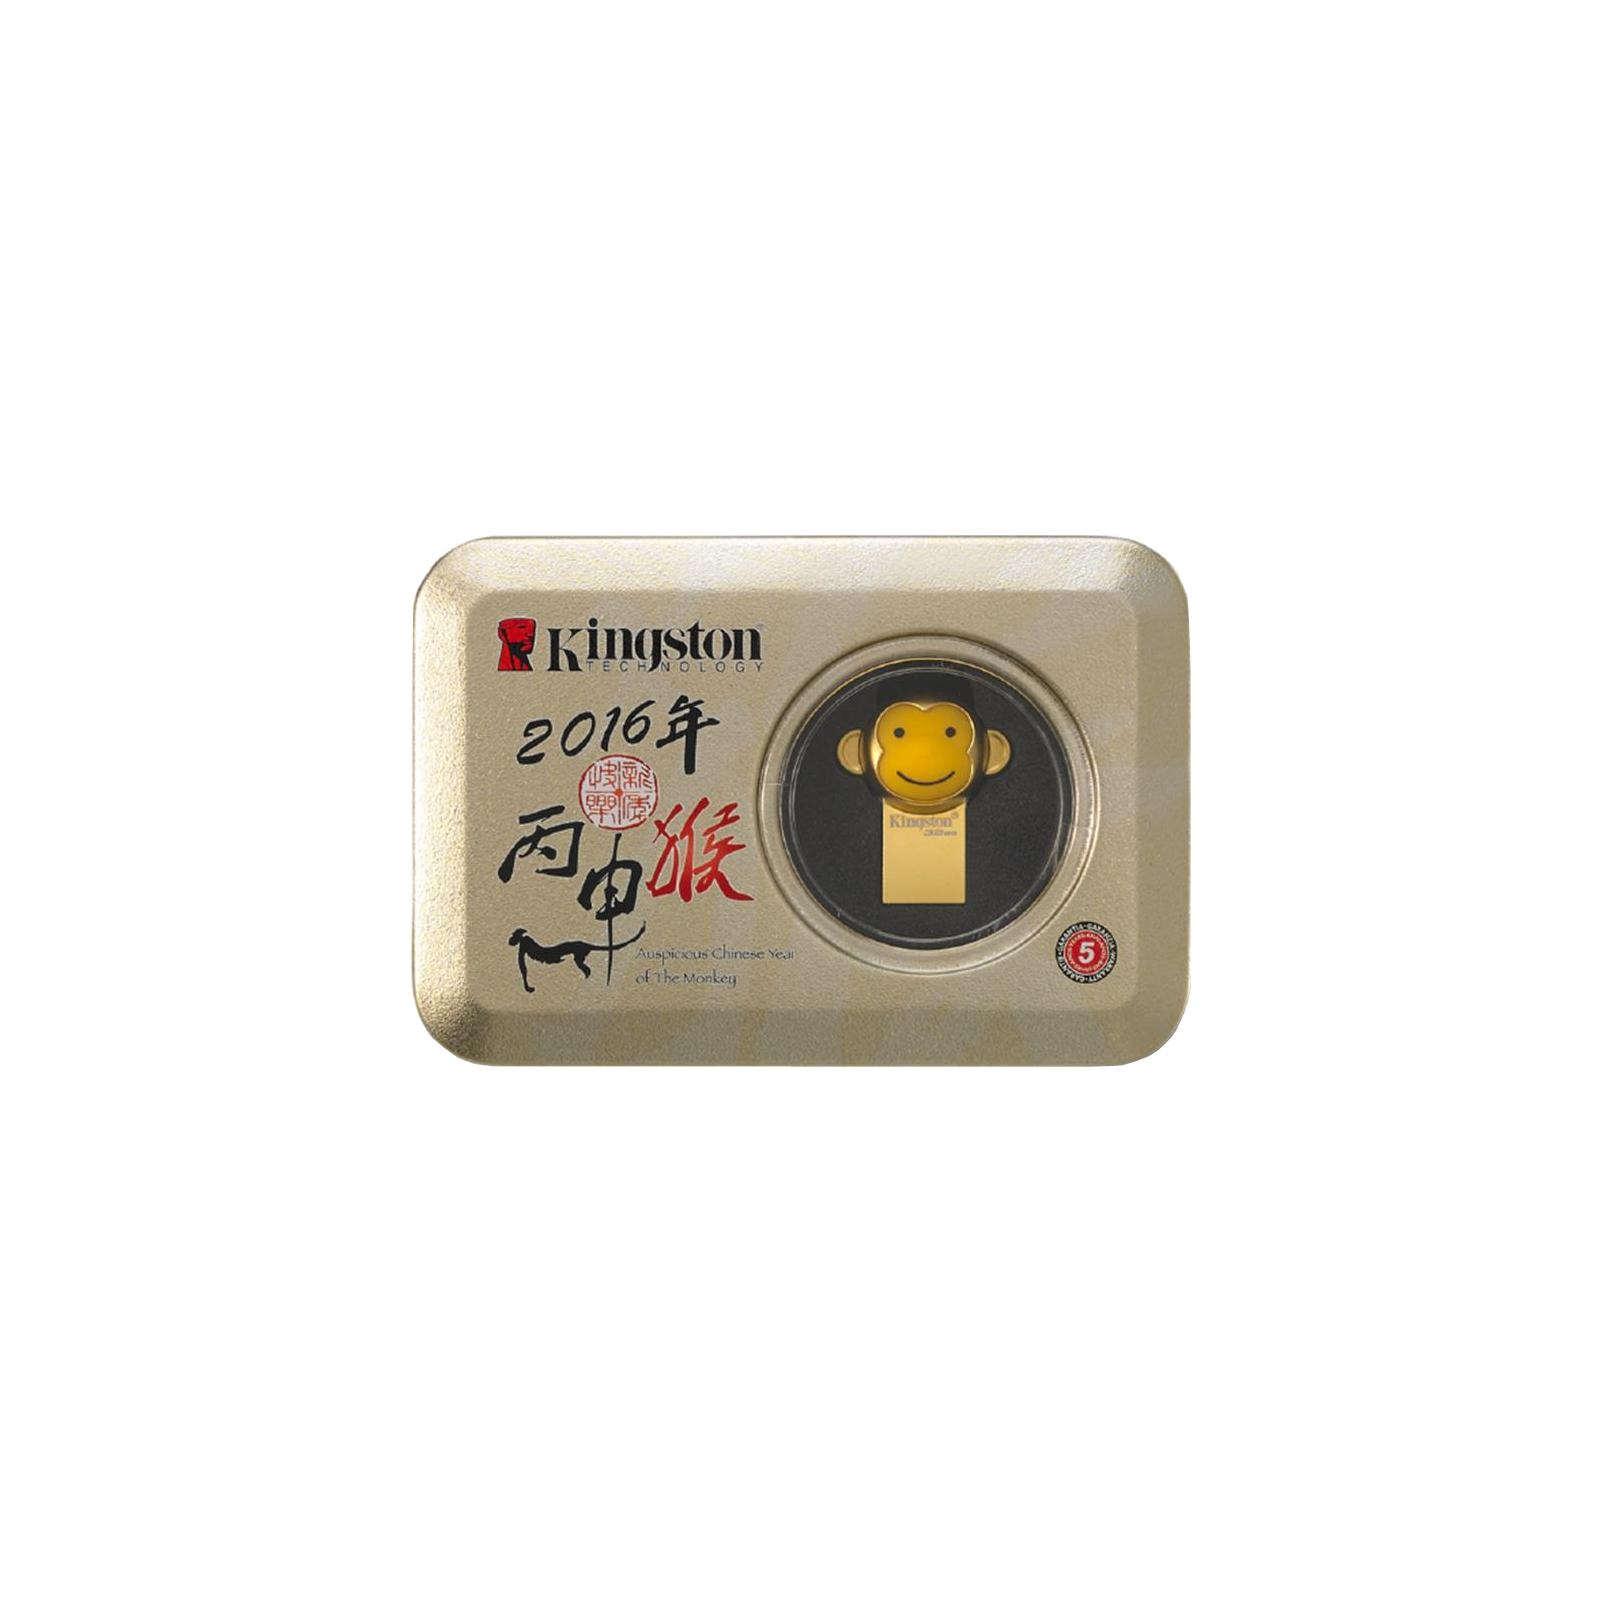 USB флеш накопитель Kingston 32GB Year of Monkey USB3.0/3.1 (DTCNY16/32GB) изображение 7